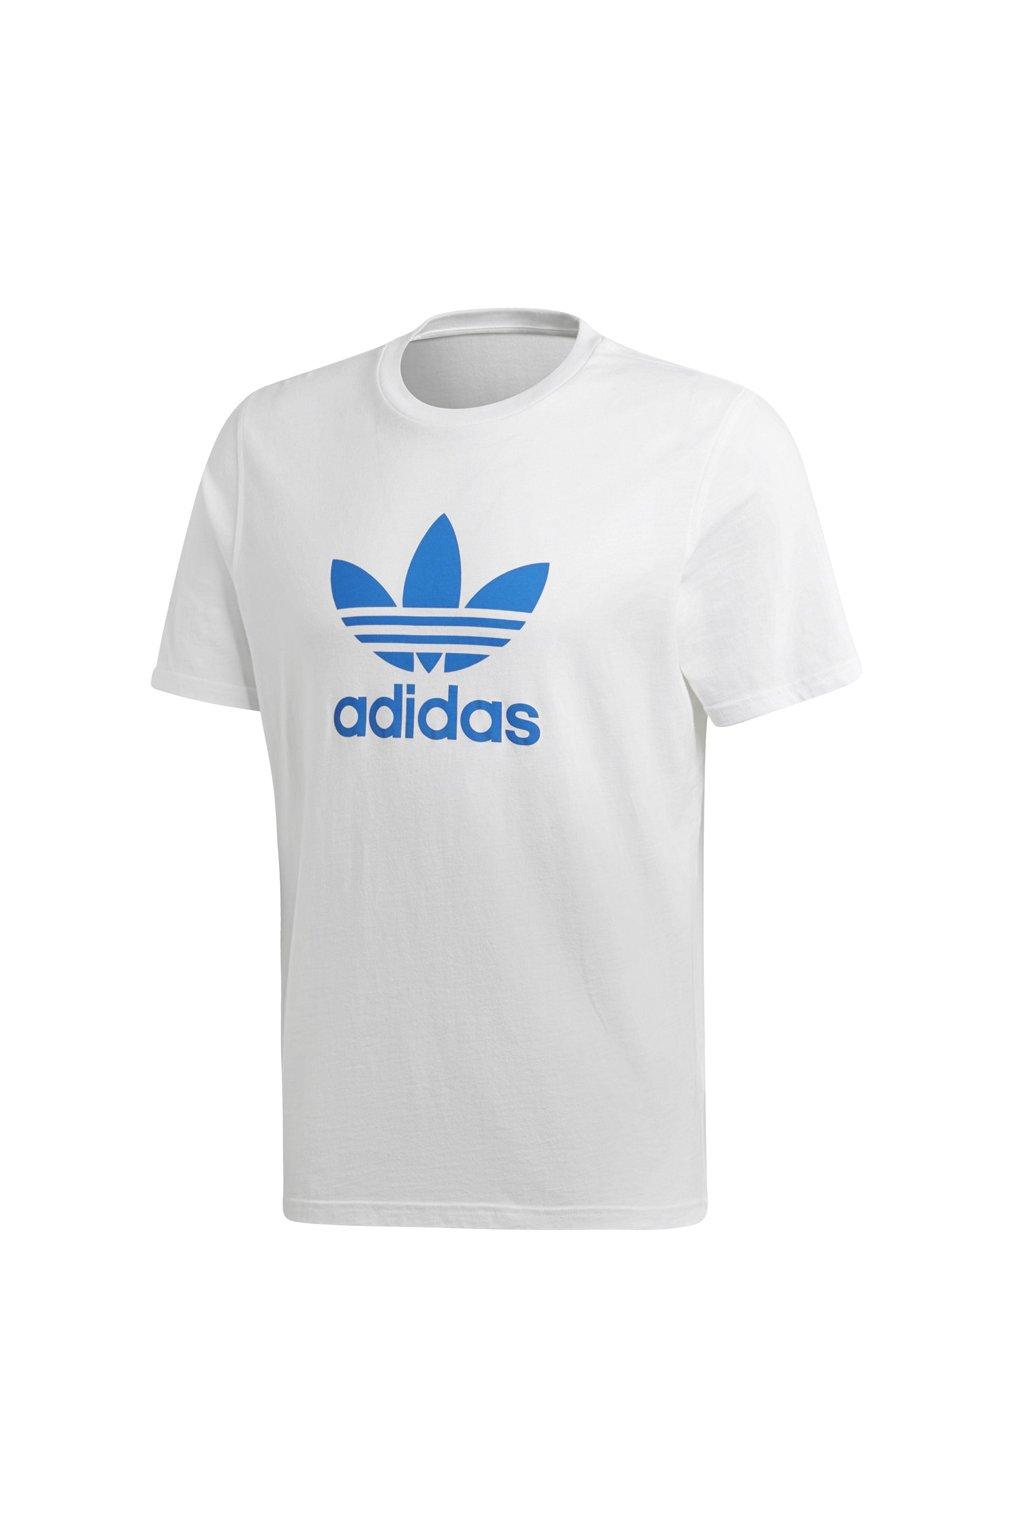 Pánske tričko Adidas Trefoil biele DH5774